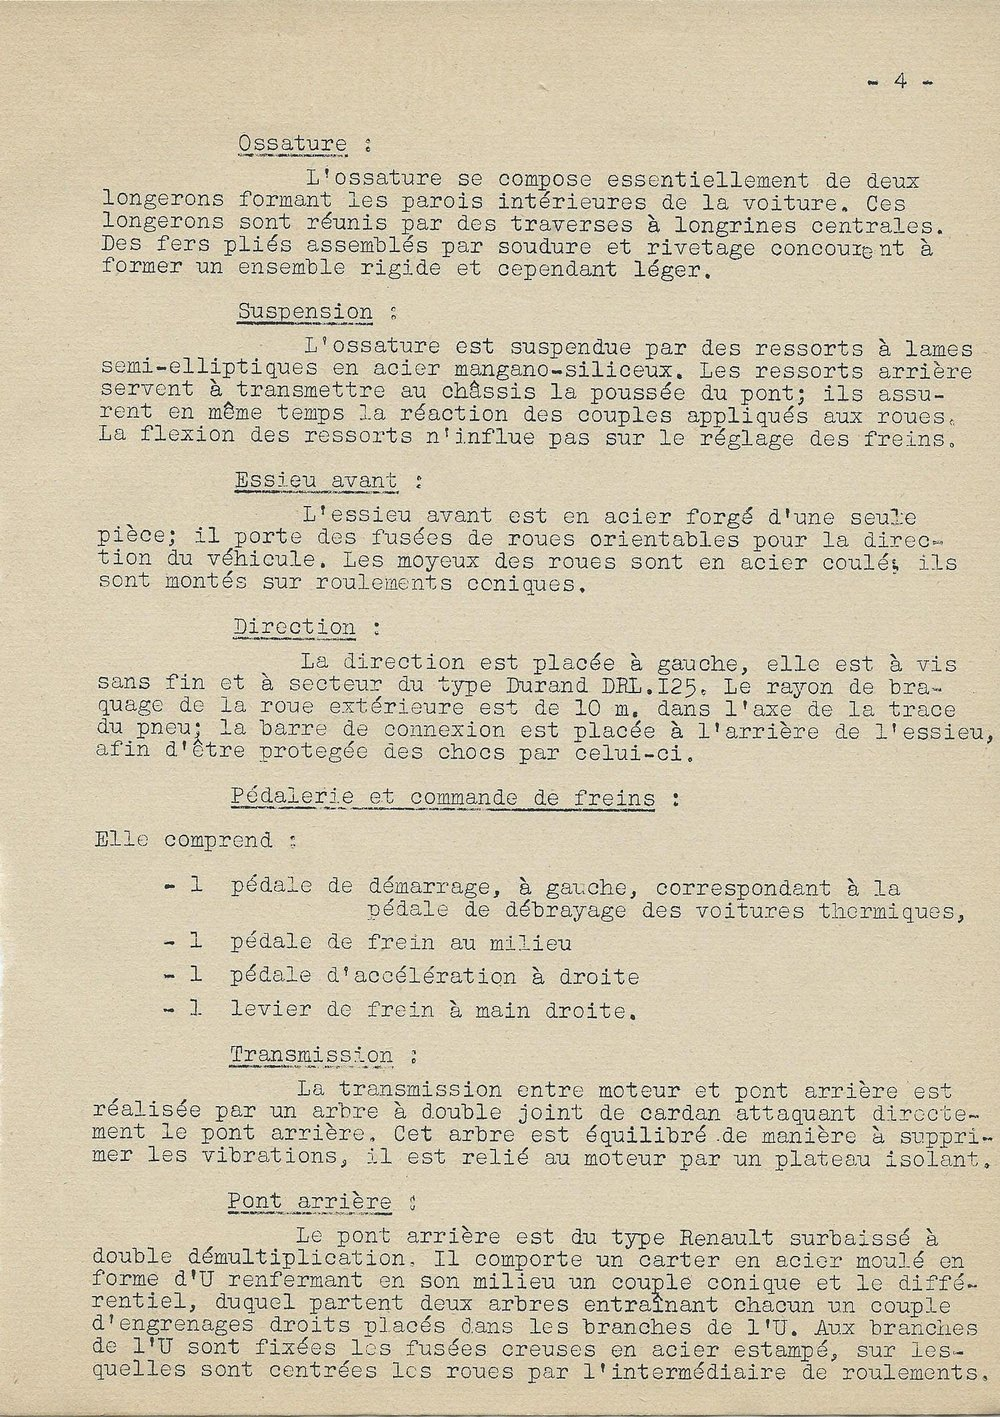 VRBh, série Aix-Marseille, str. 4